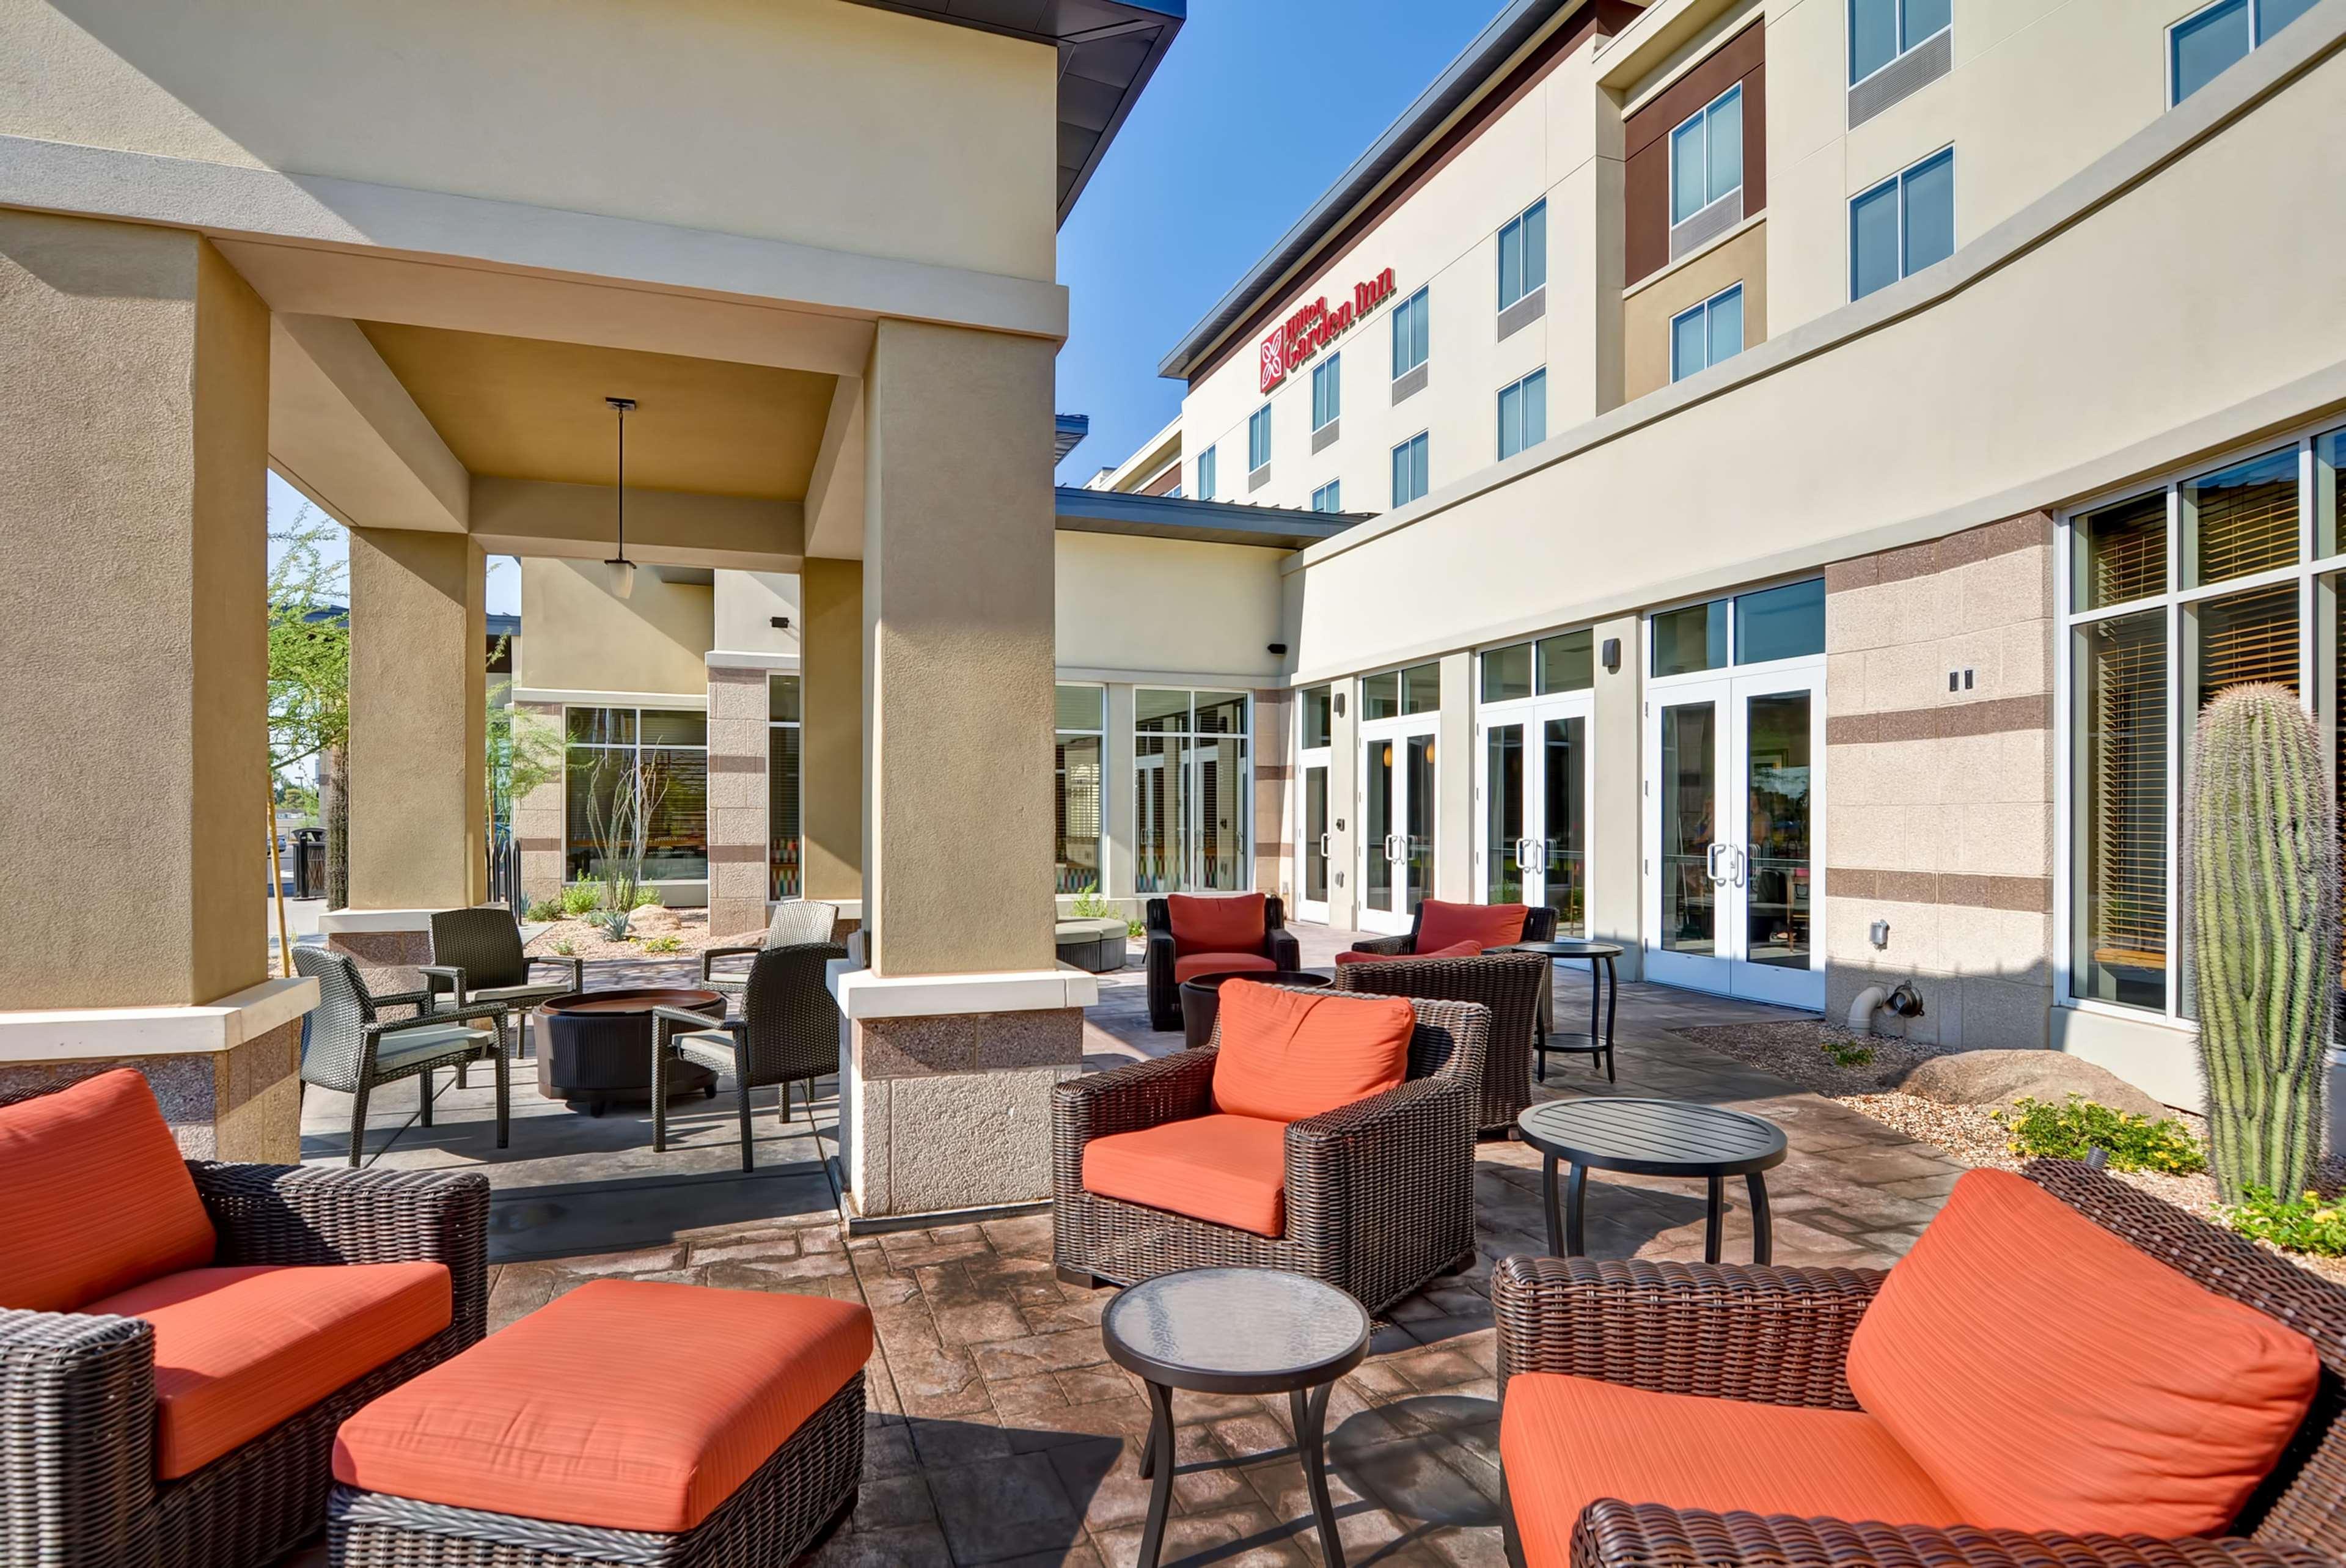 Hilton Garden Inn Phoenix/Tempe ASU Area